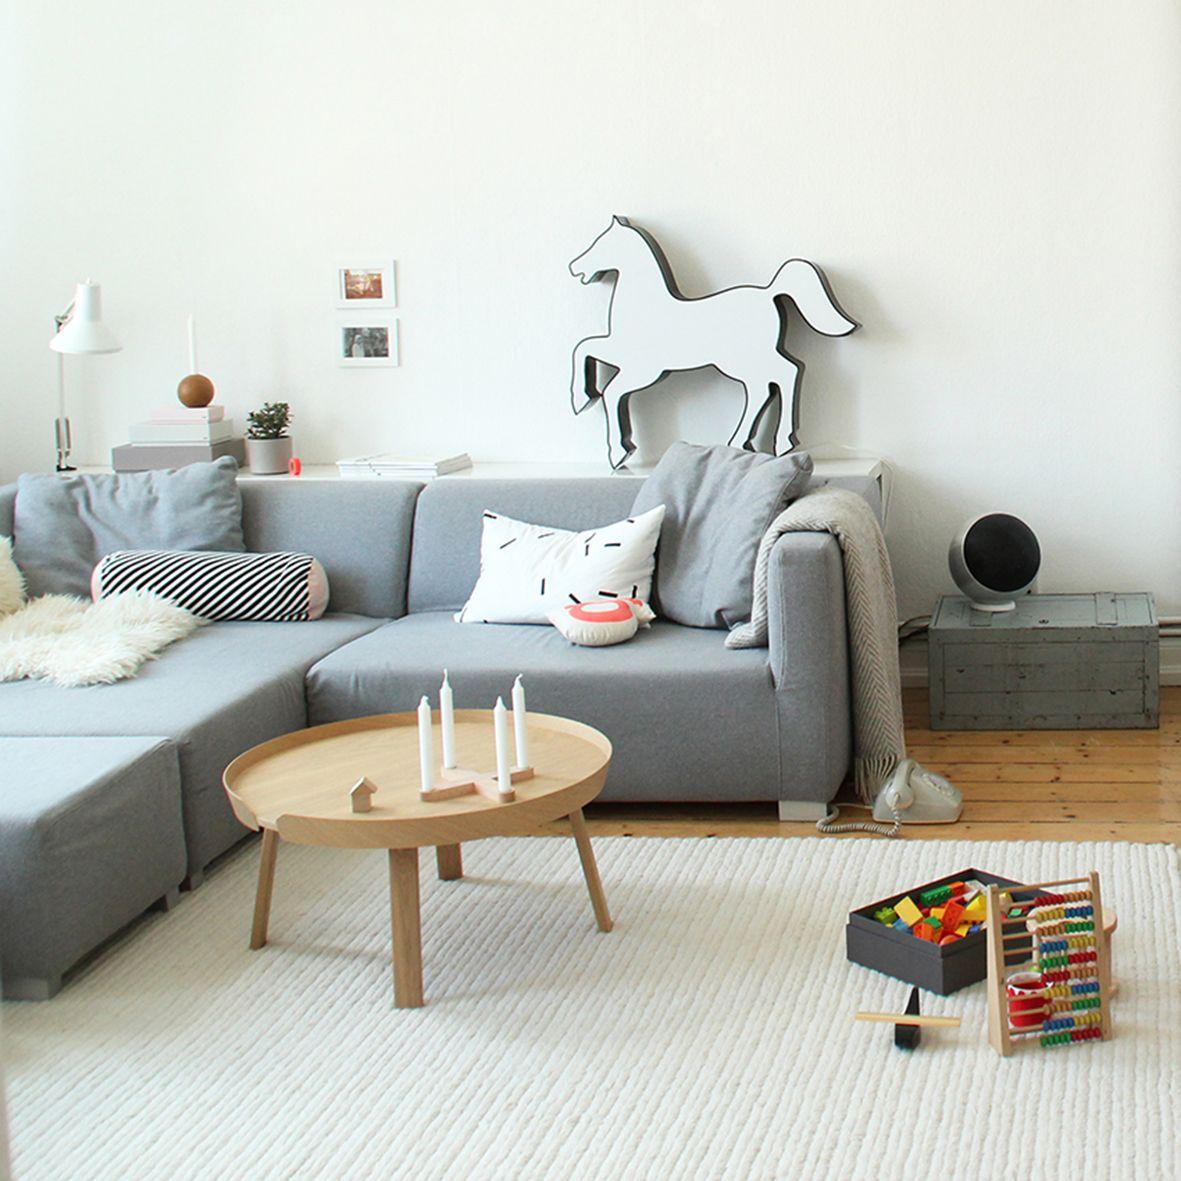 Vintage mitte jahrhundert wohnzimmer such a good idea for a living room livingroom space  deas